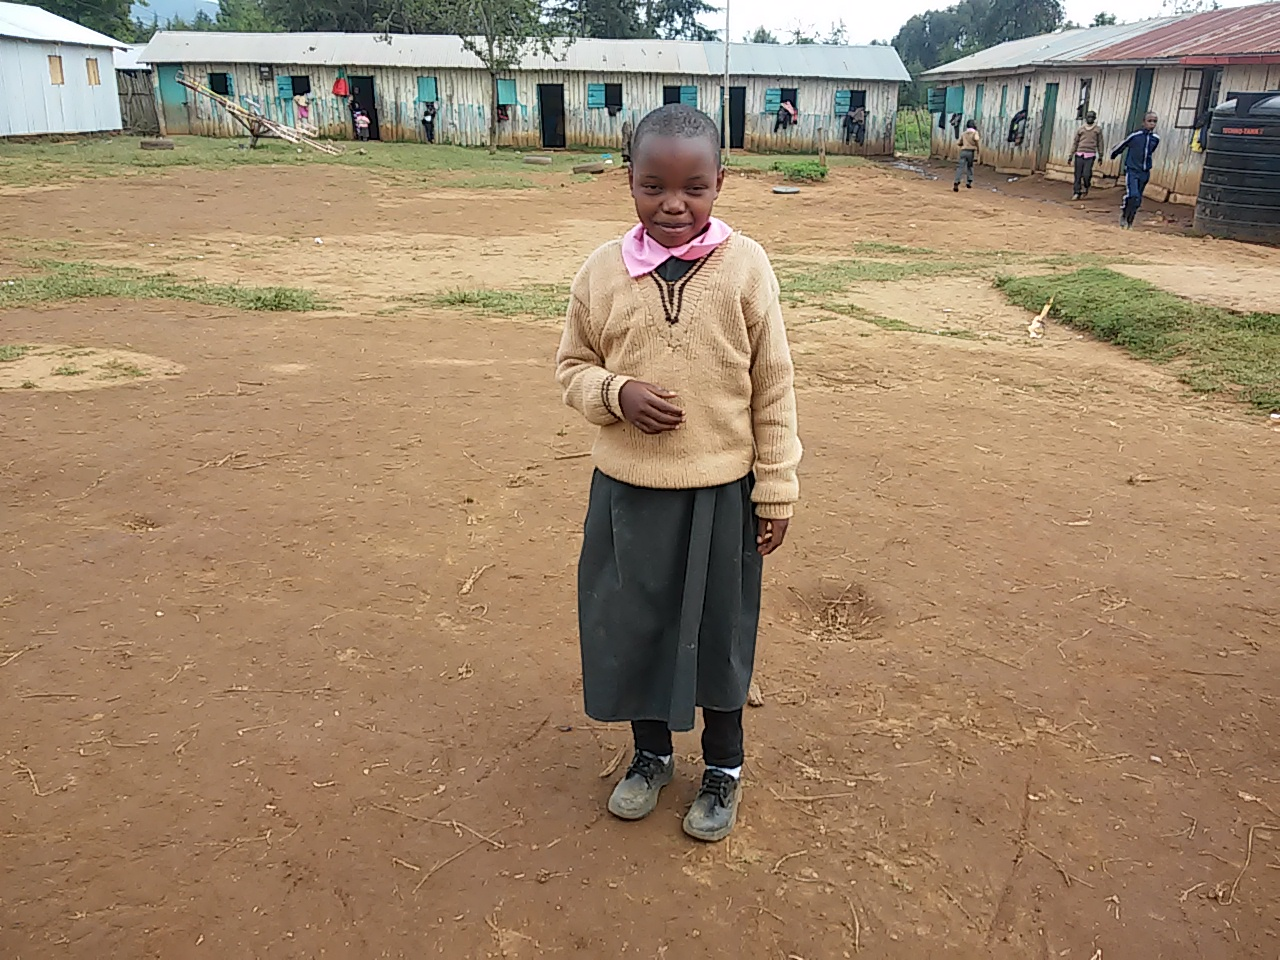 Athanasia Mwende